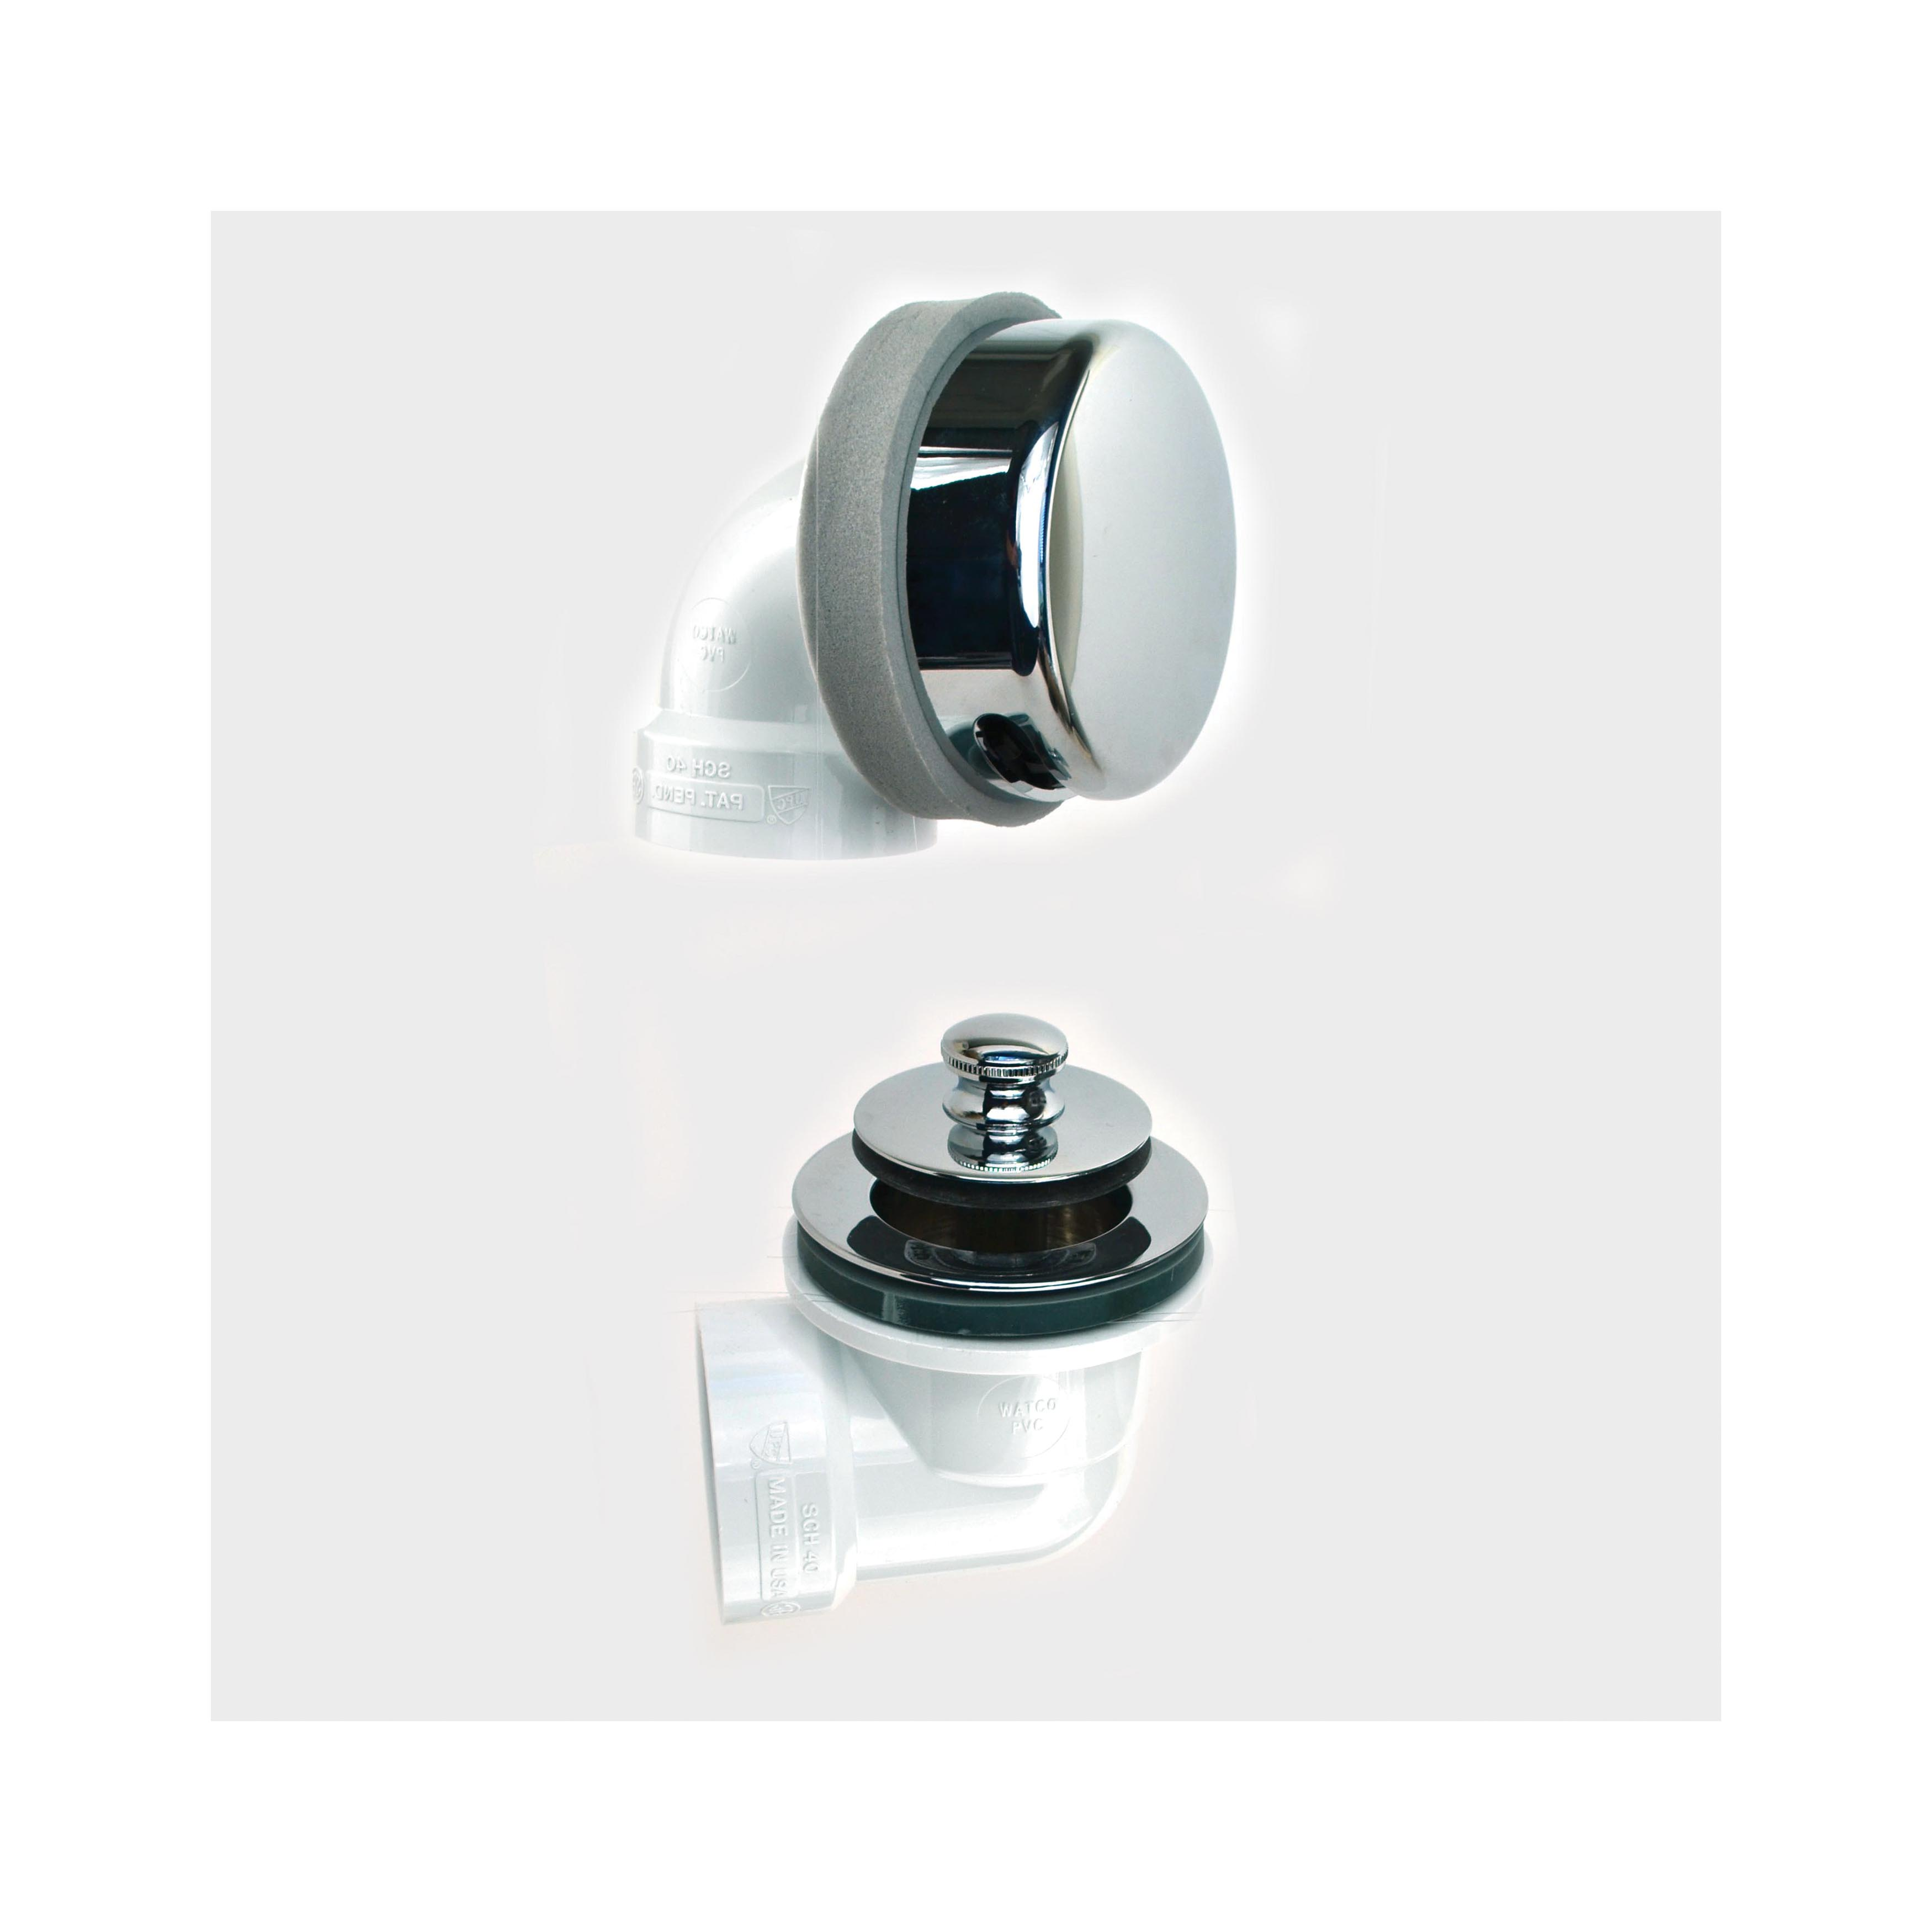 Watco® 901-PP-PVC-CP Innovator® 901 Solvent Weld Bath Waste Half Kit, STD PVC, Chrome Plated